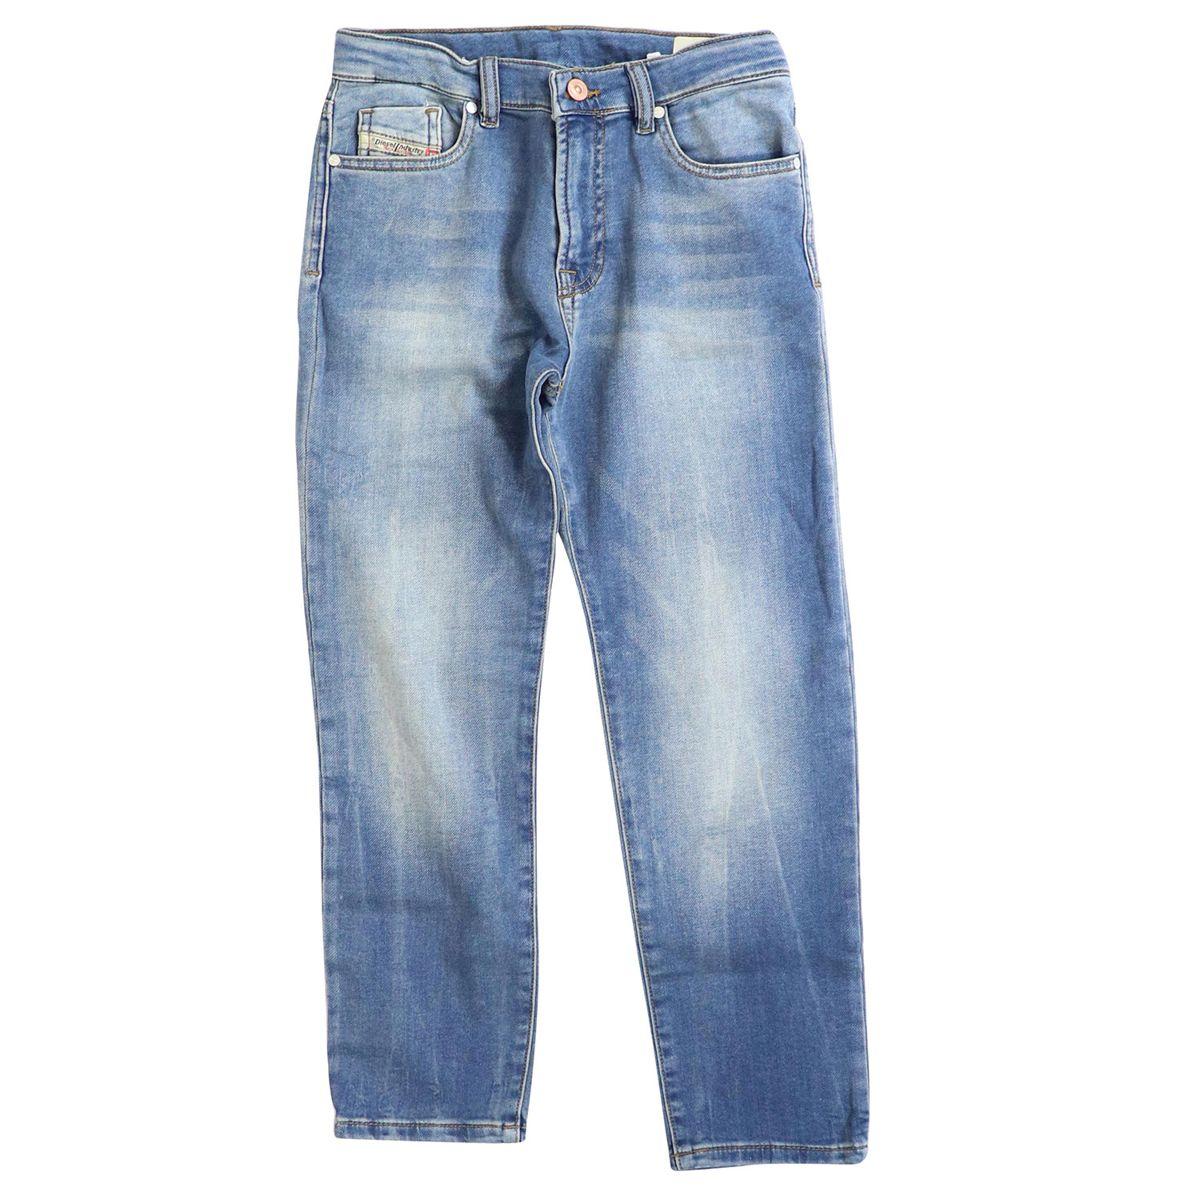 Stretch denim girl jeans MHARKY Medium denim Diesel